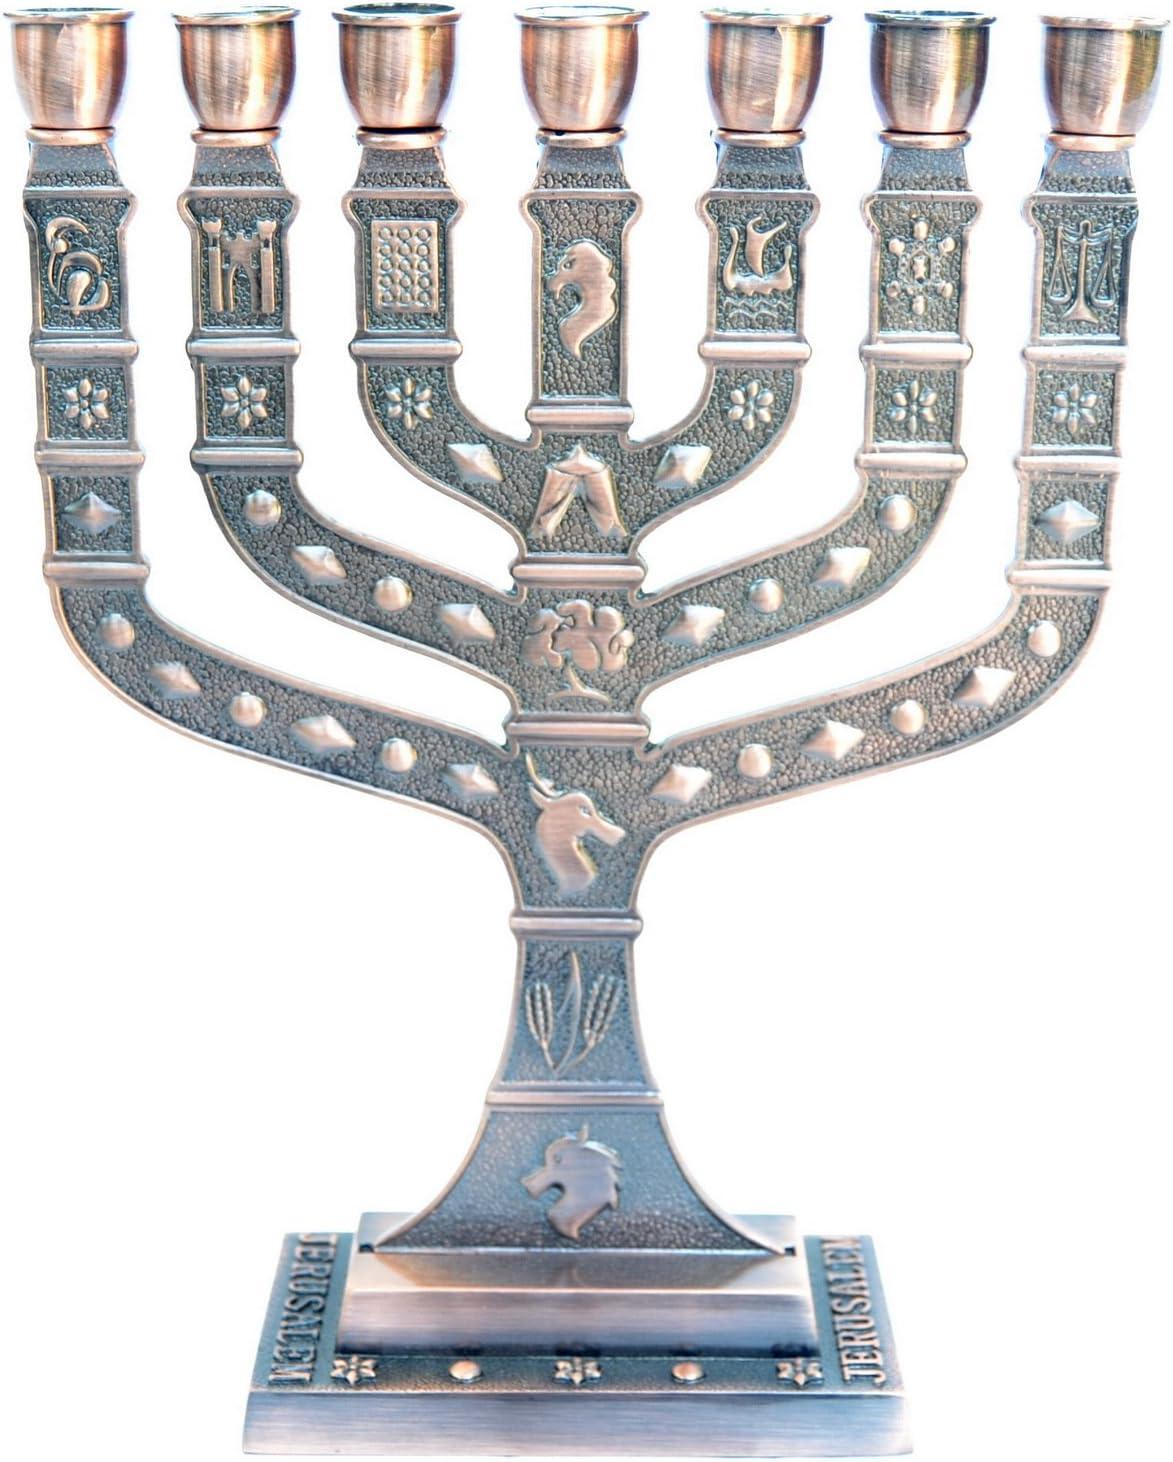 Menorah Menora Holyland 7 Branches Jerusalem Miami Mall Ranking TOP2 12 of Israe Tribes